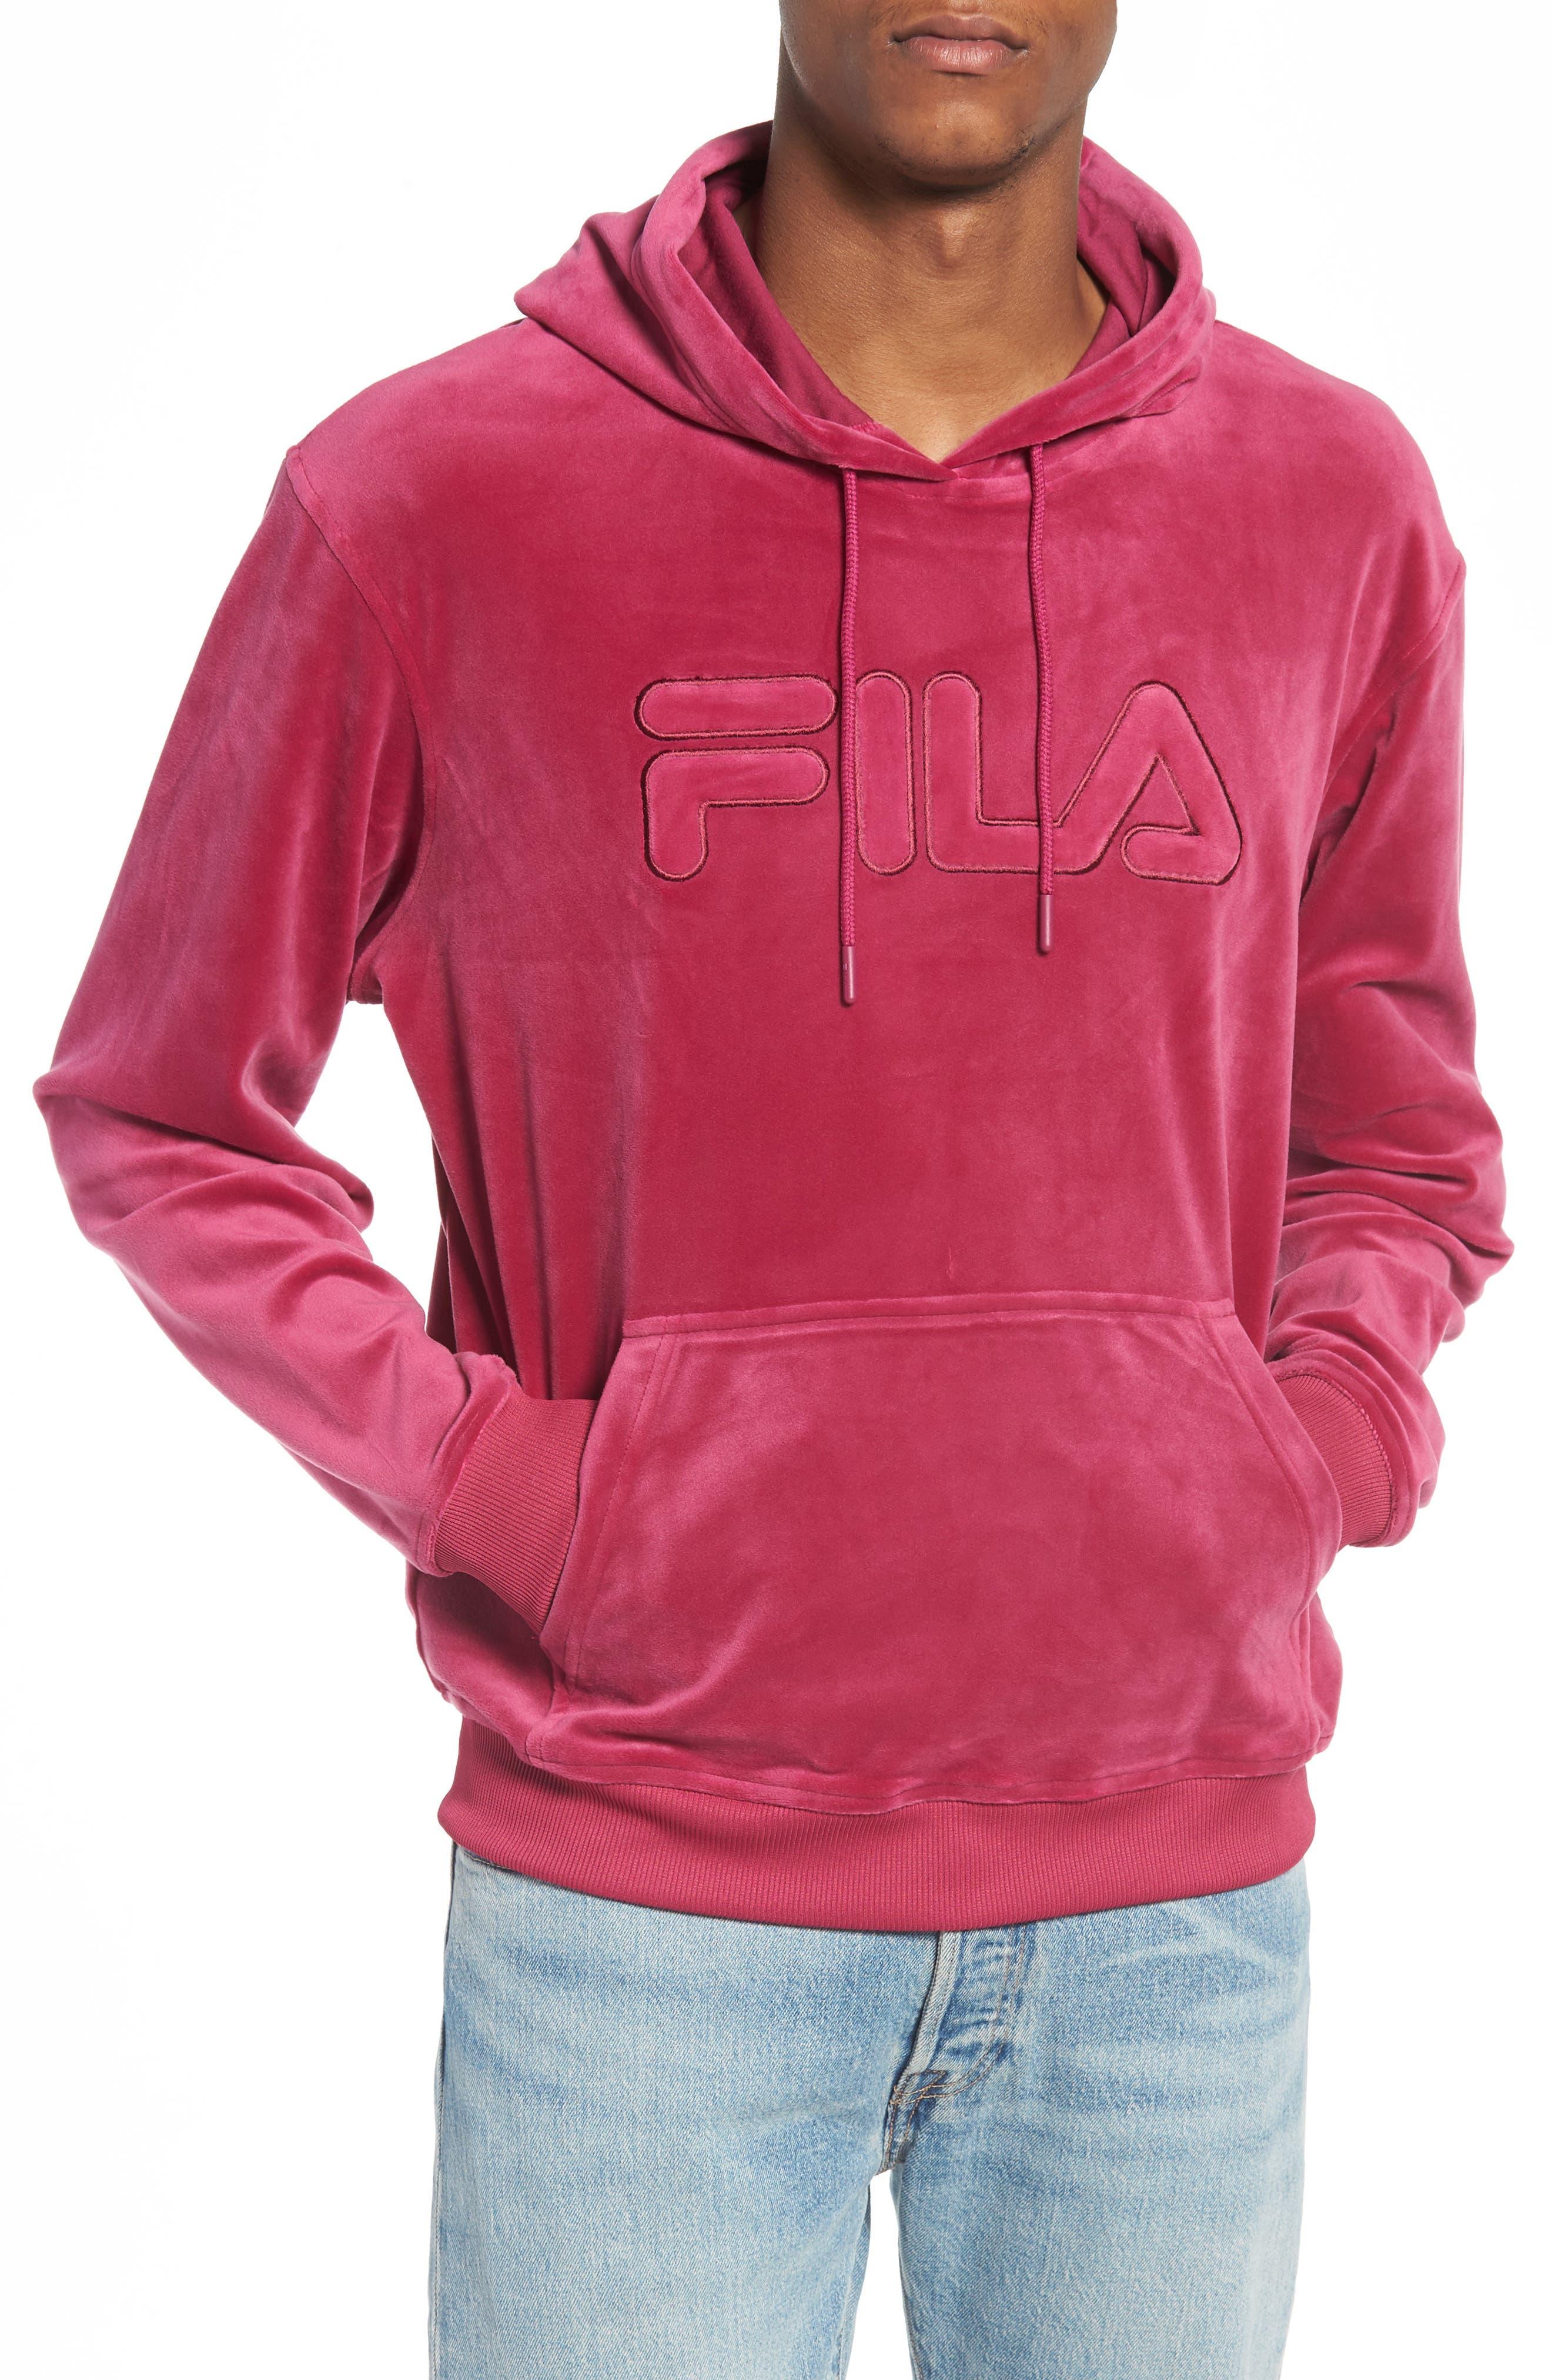 Asher Velour Hoodie Sweatshirt,                         Main,                         color, Rasberry Radiance